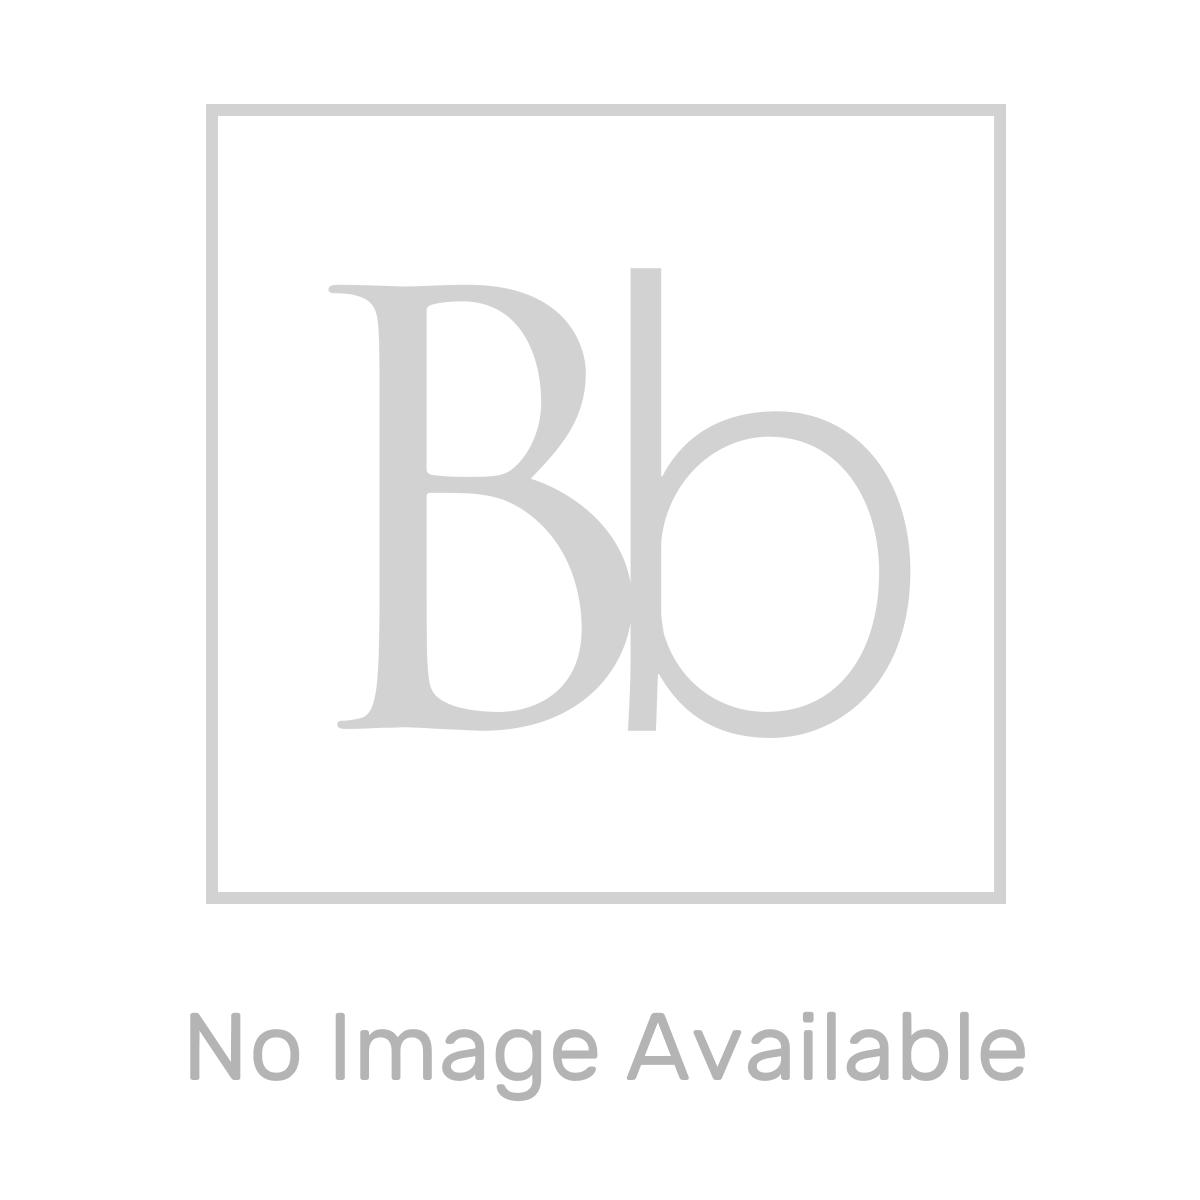 Winterburn Roll Top Bath with Corbel Feet